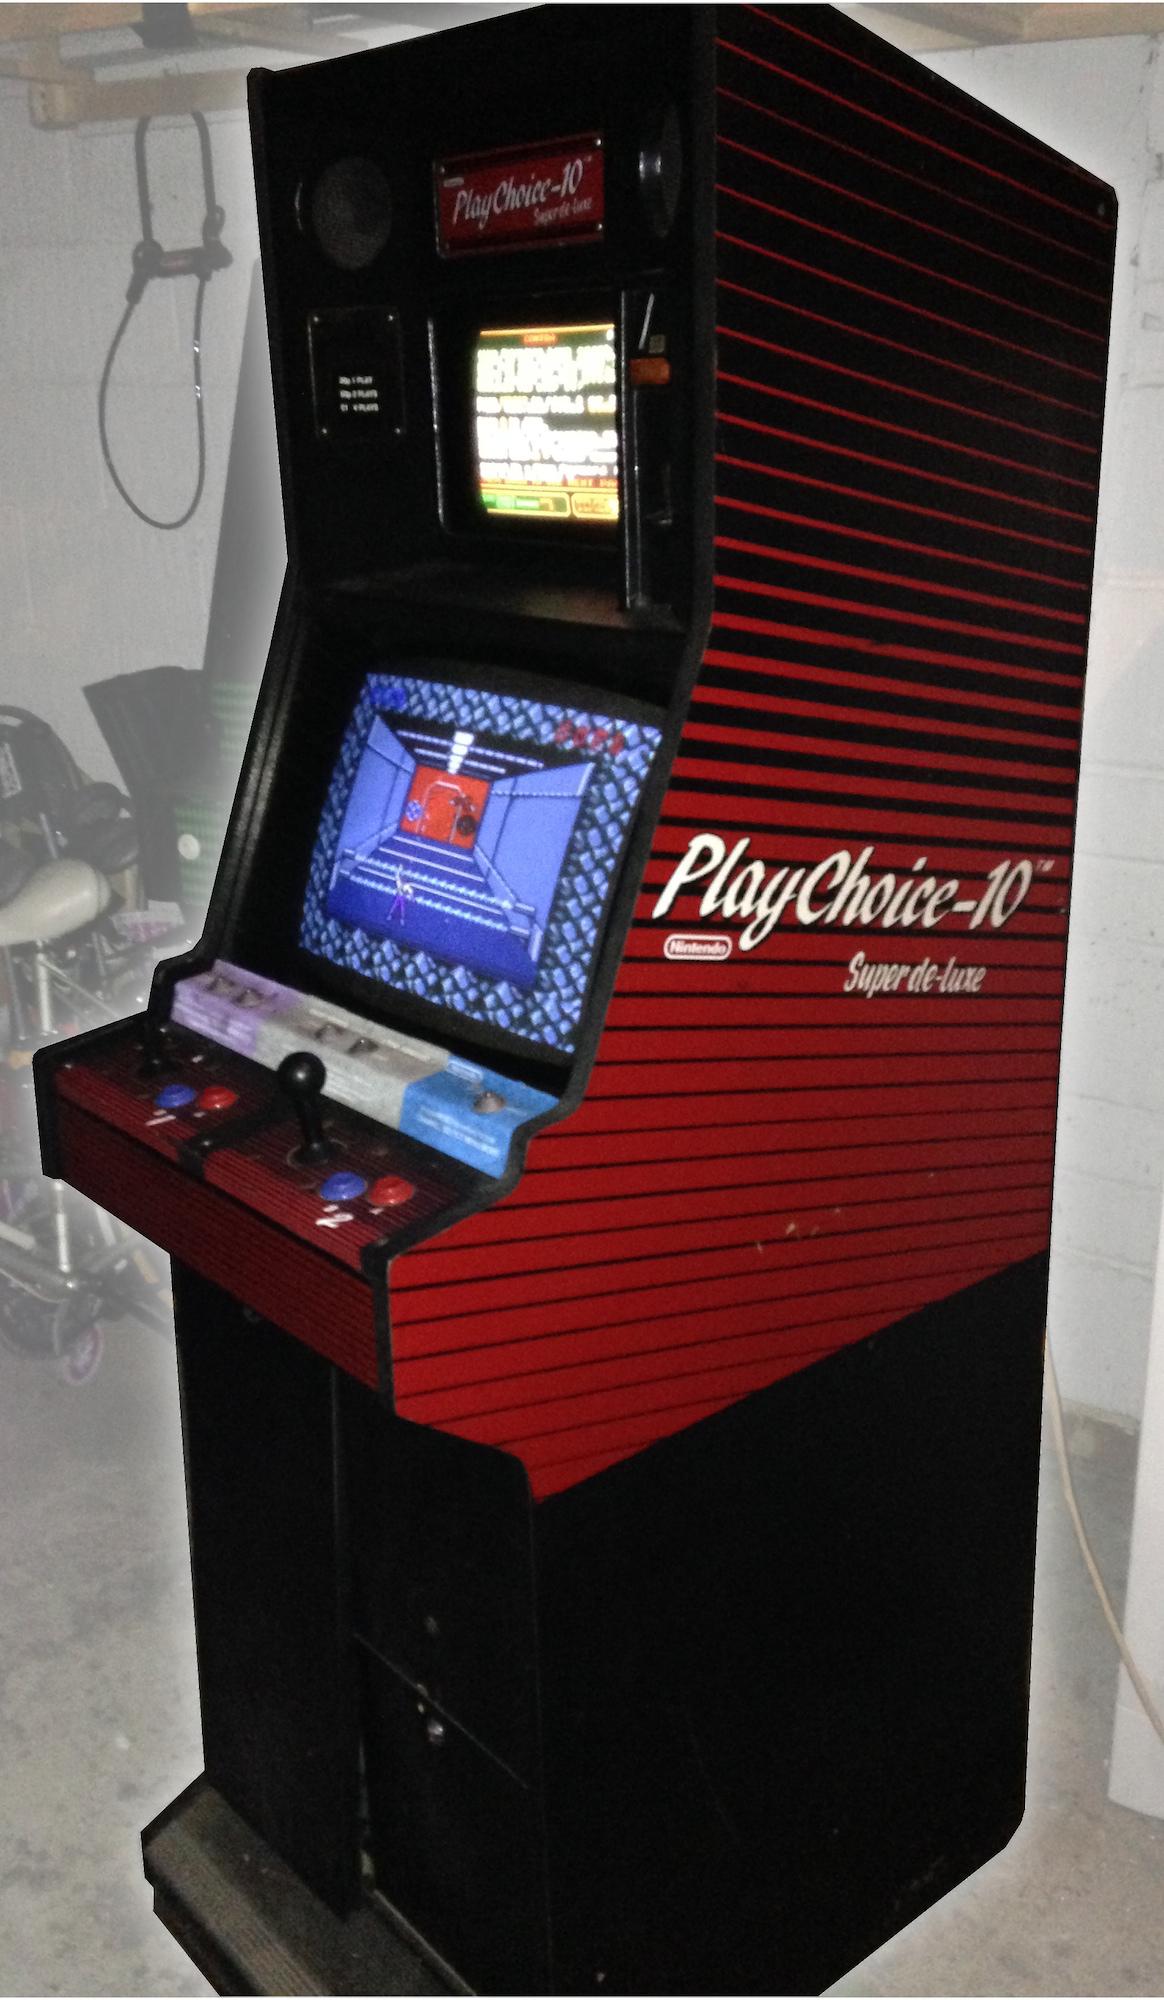 Nintendo PlayChoice 10